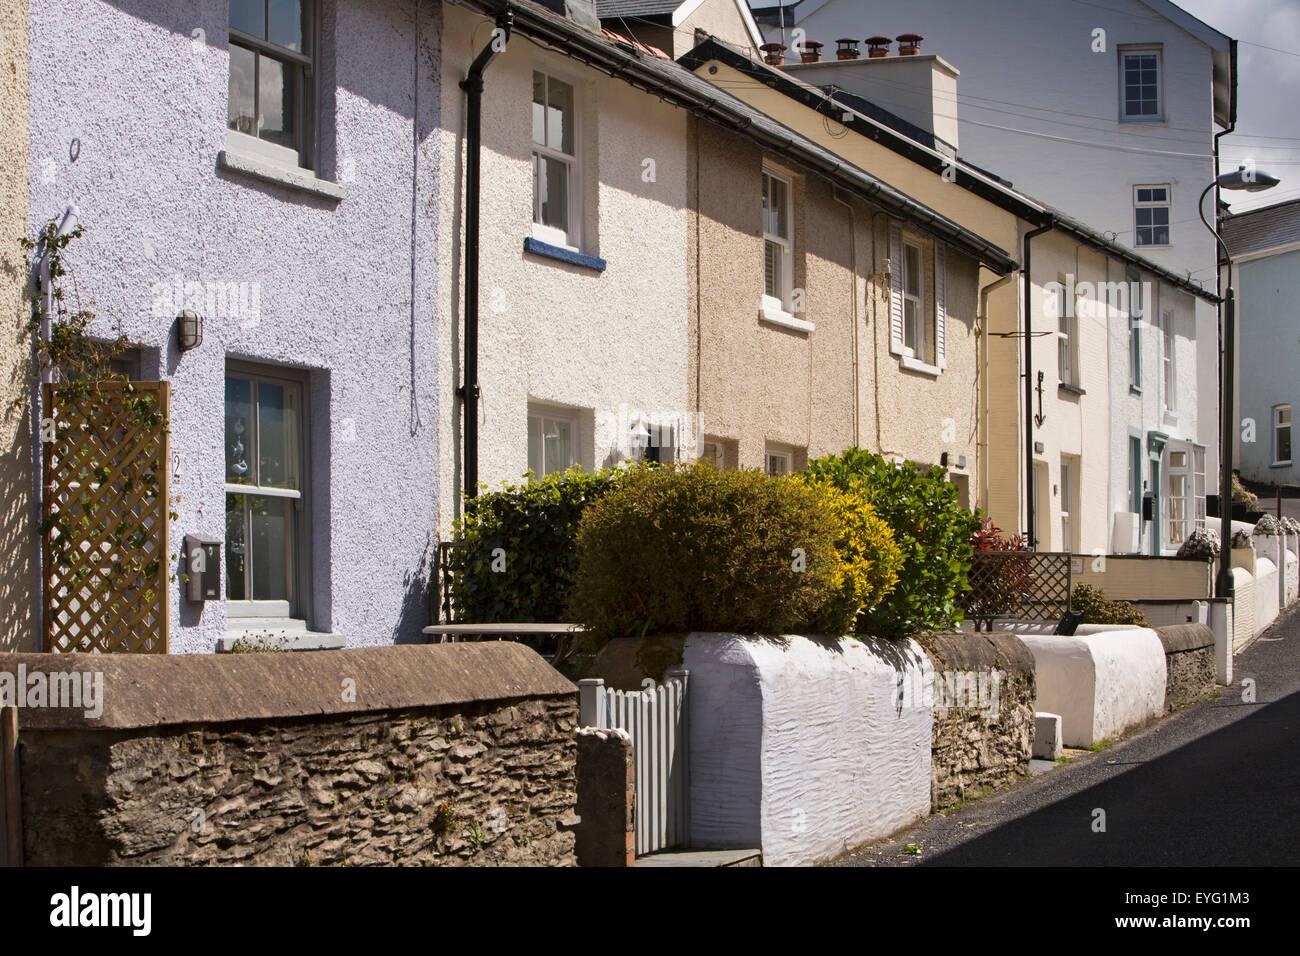 UK, Wales, Gwynedd, Aberdovey, Church Street, small fishermen's houses Stock Photo